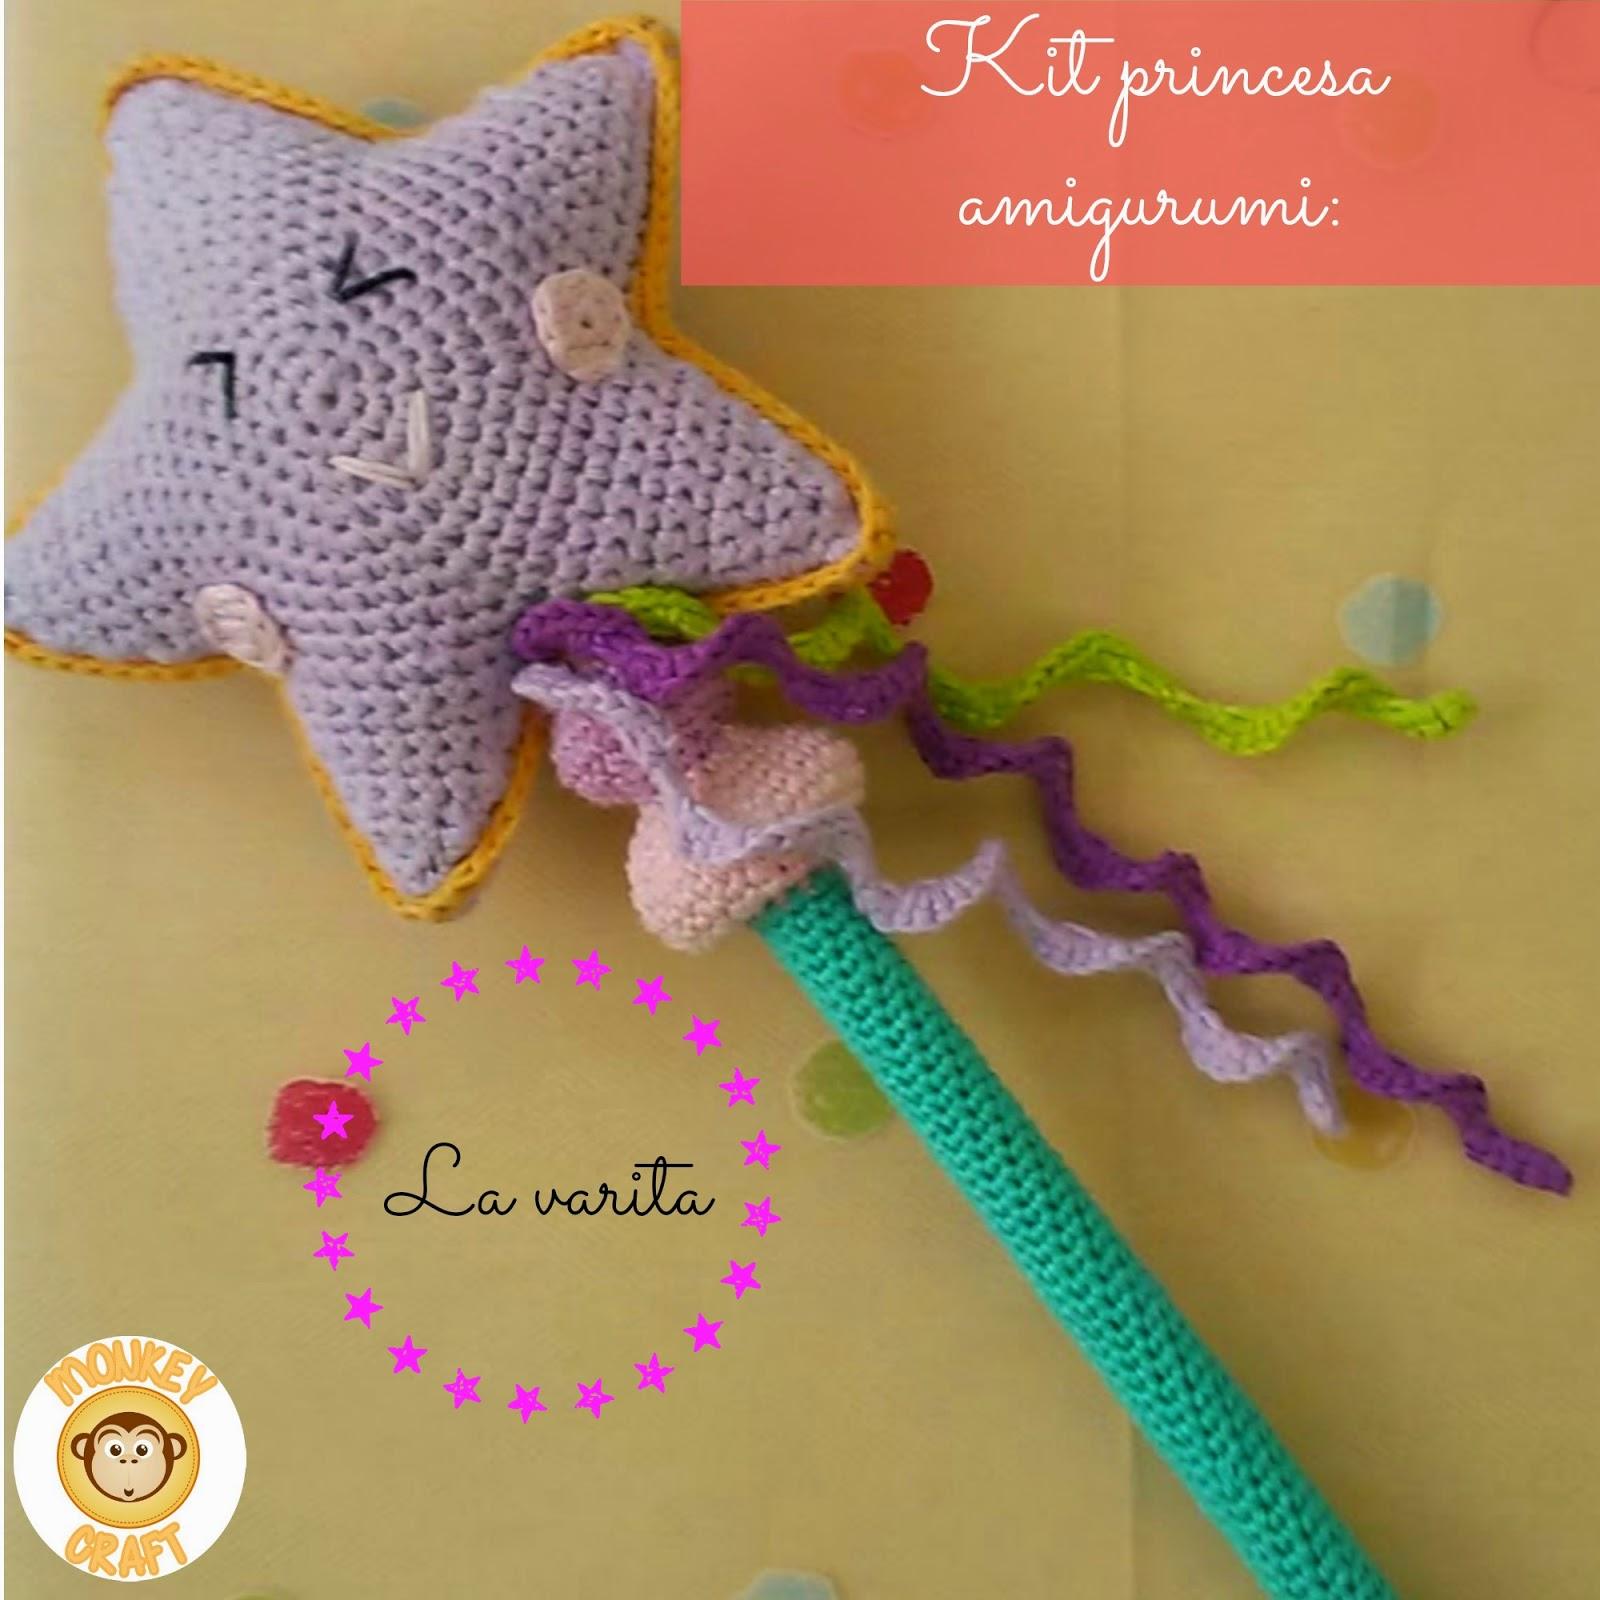 Tutorial Estrella Amigurumi Star : Monkey Craft: Kit princesa amigurumi: la varita magica